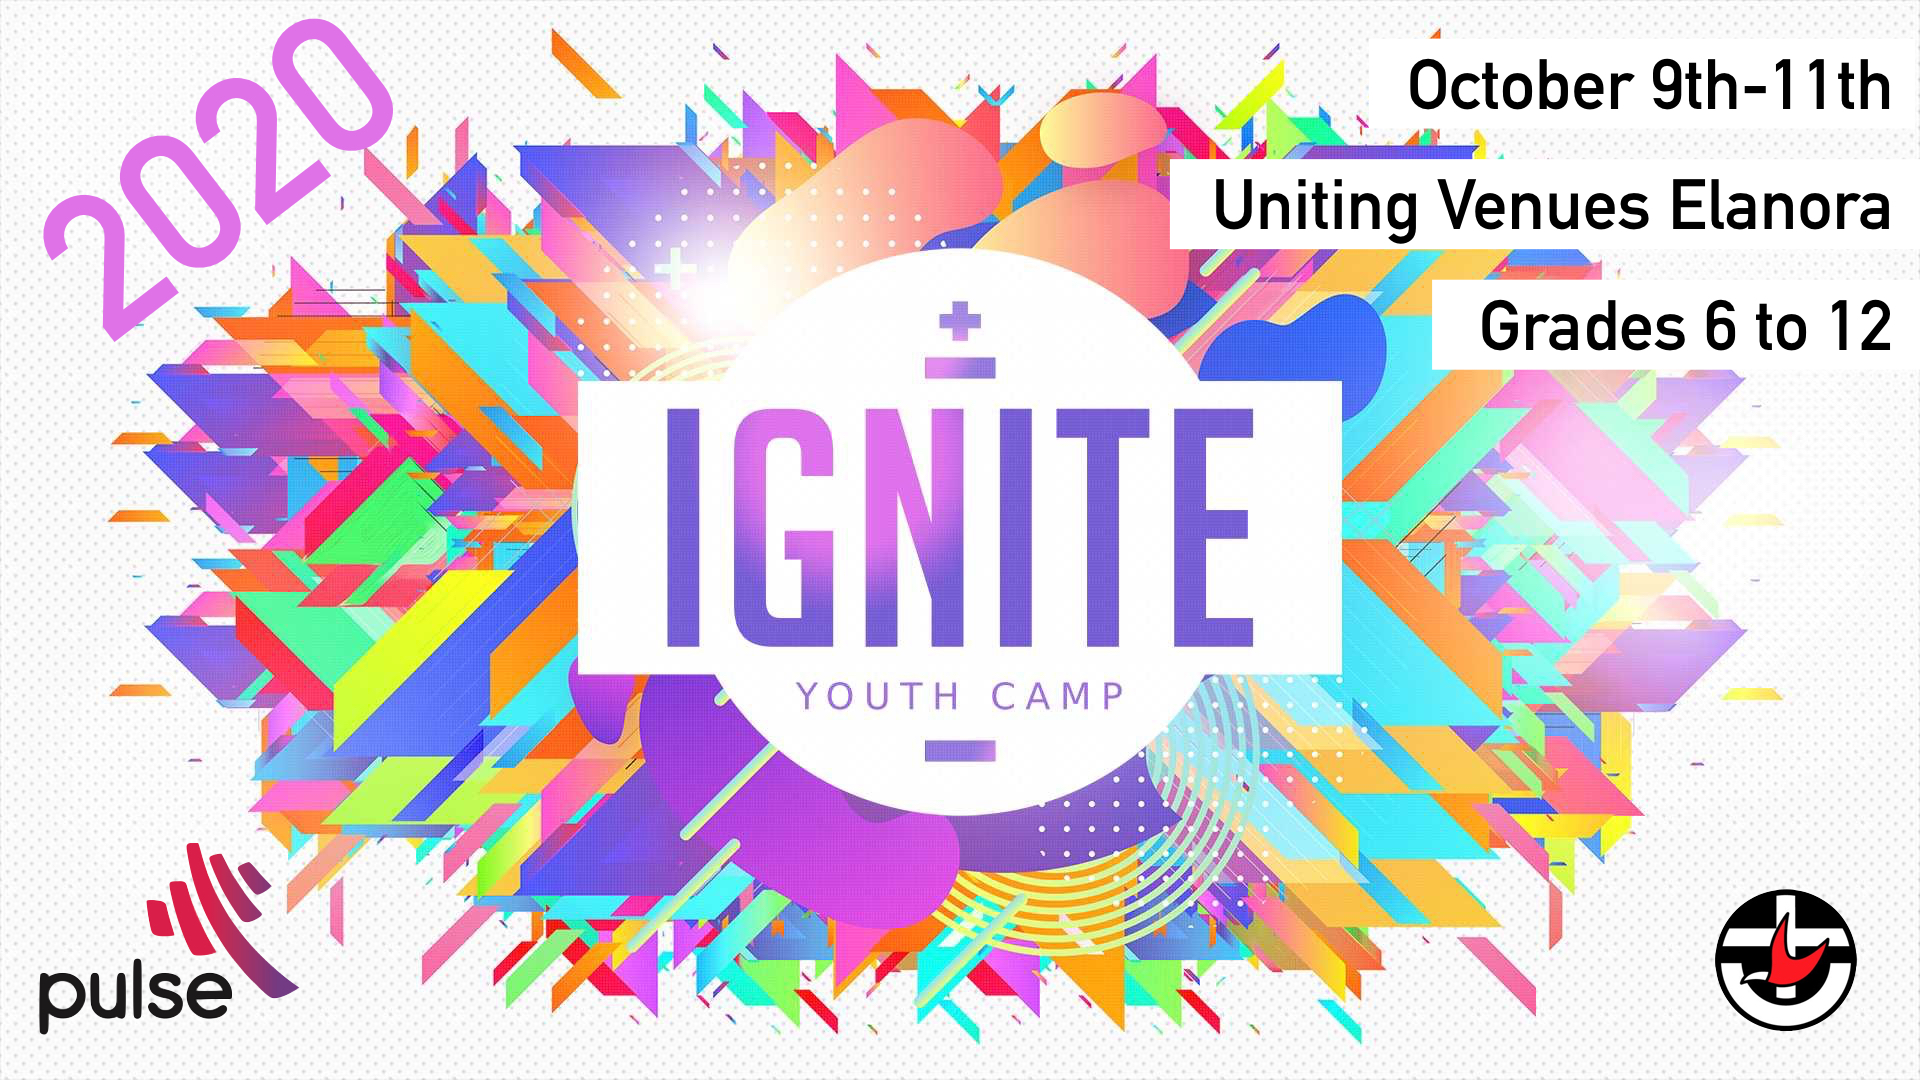 IGNITE Youth Camp